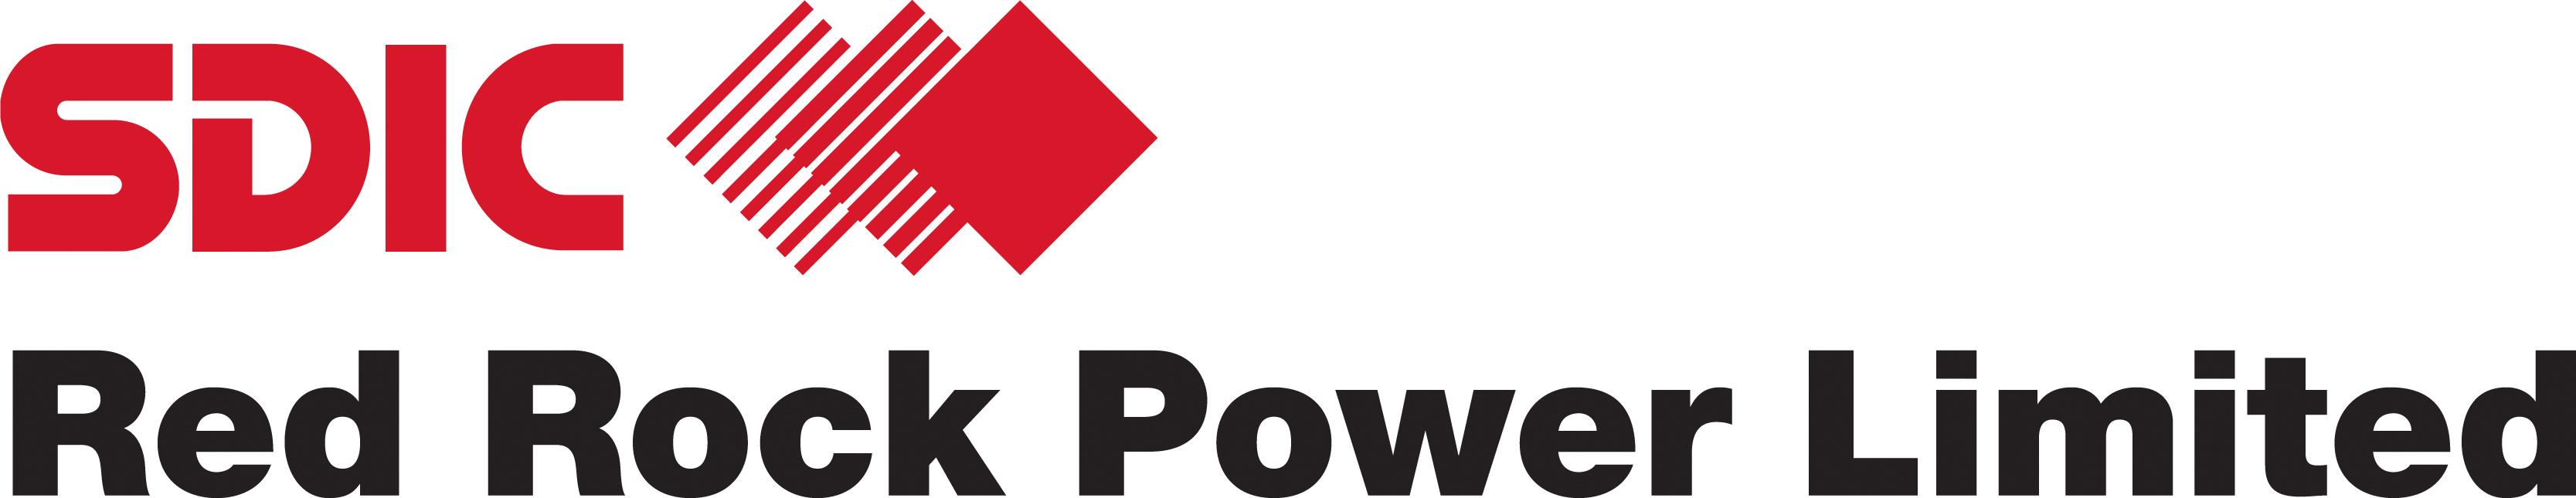 Red Rock Power Ltd